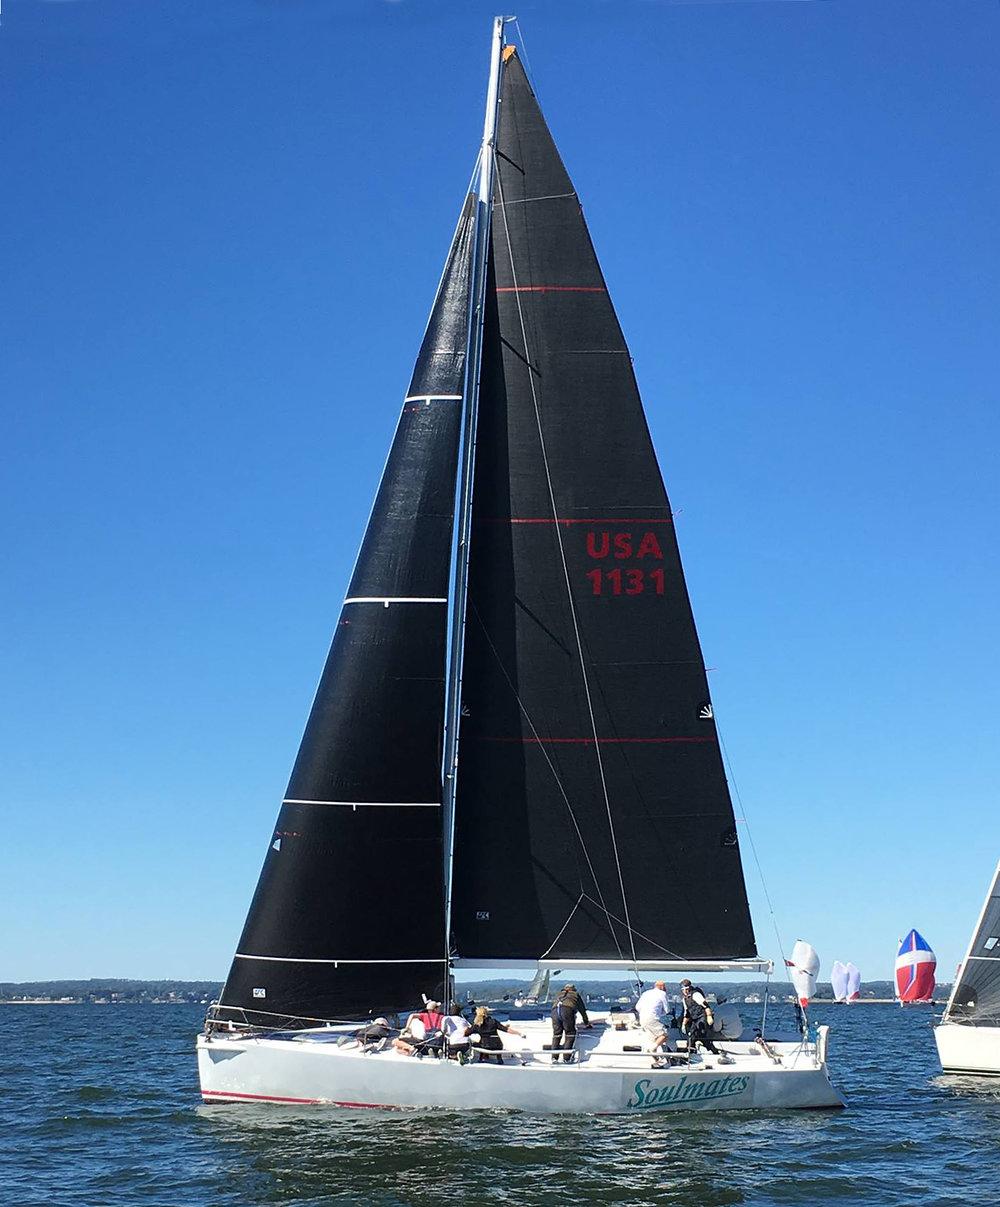 SOULMATES, a custom Roger Martin 40, with a Titanium Black non-overlapping jib and Uni-Titanium LiteSkin mainsail.